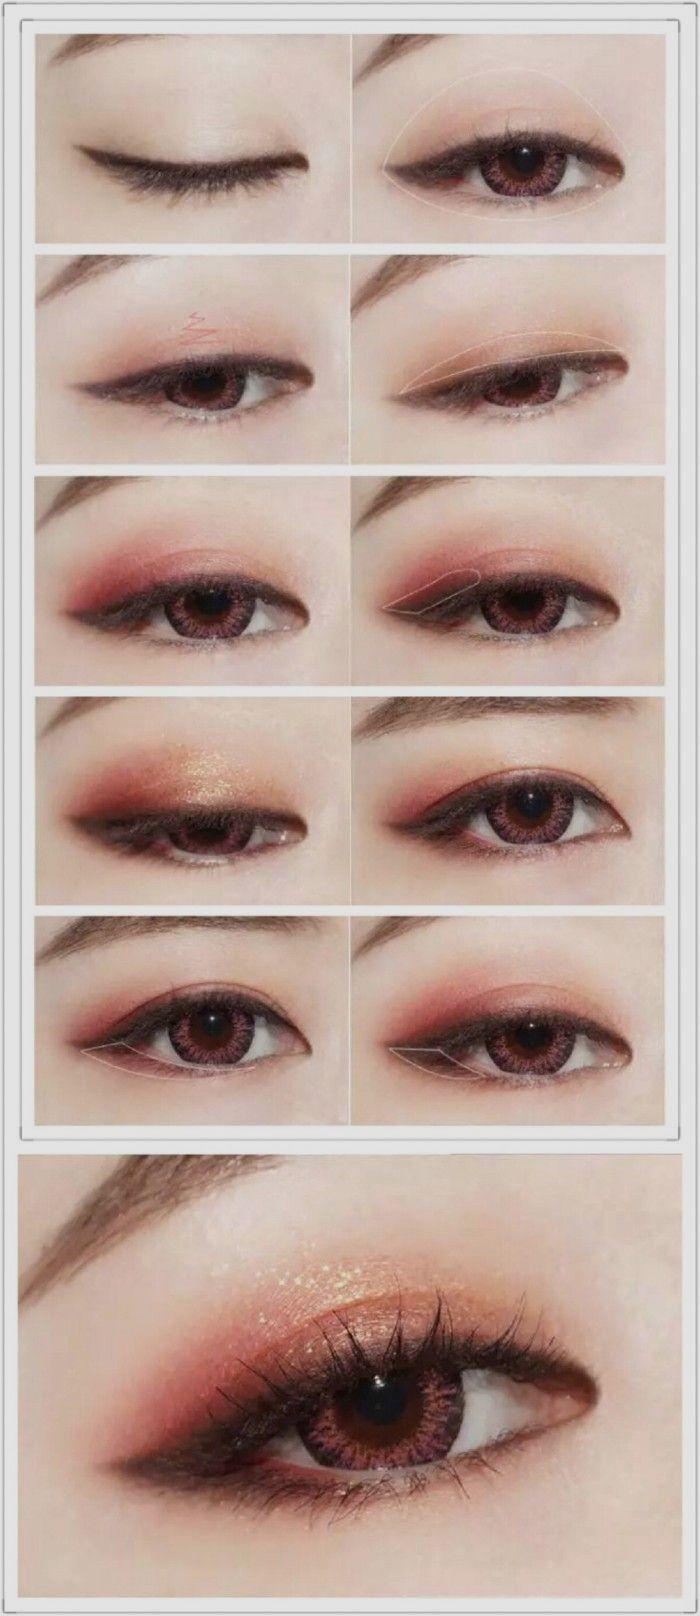 How To Make Eyes Look Bigger With Makeup Beauty Hacks Korean Eye Makeup Eye Makeup Big Eyes Makeup